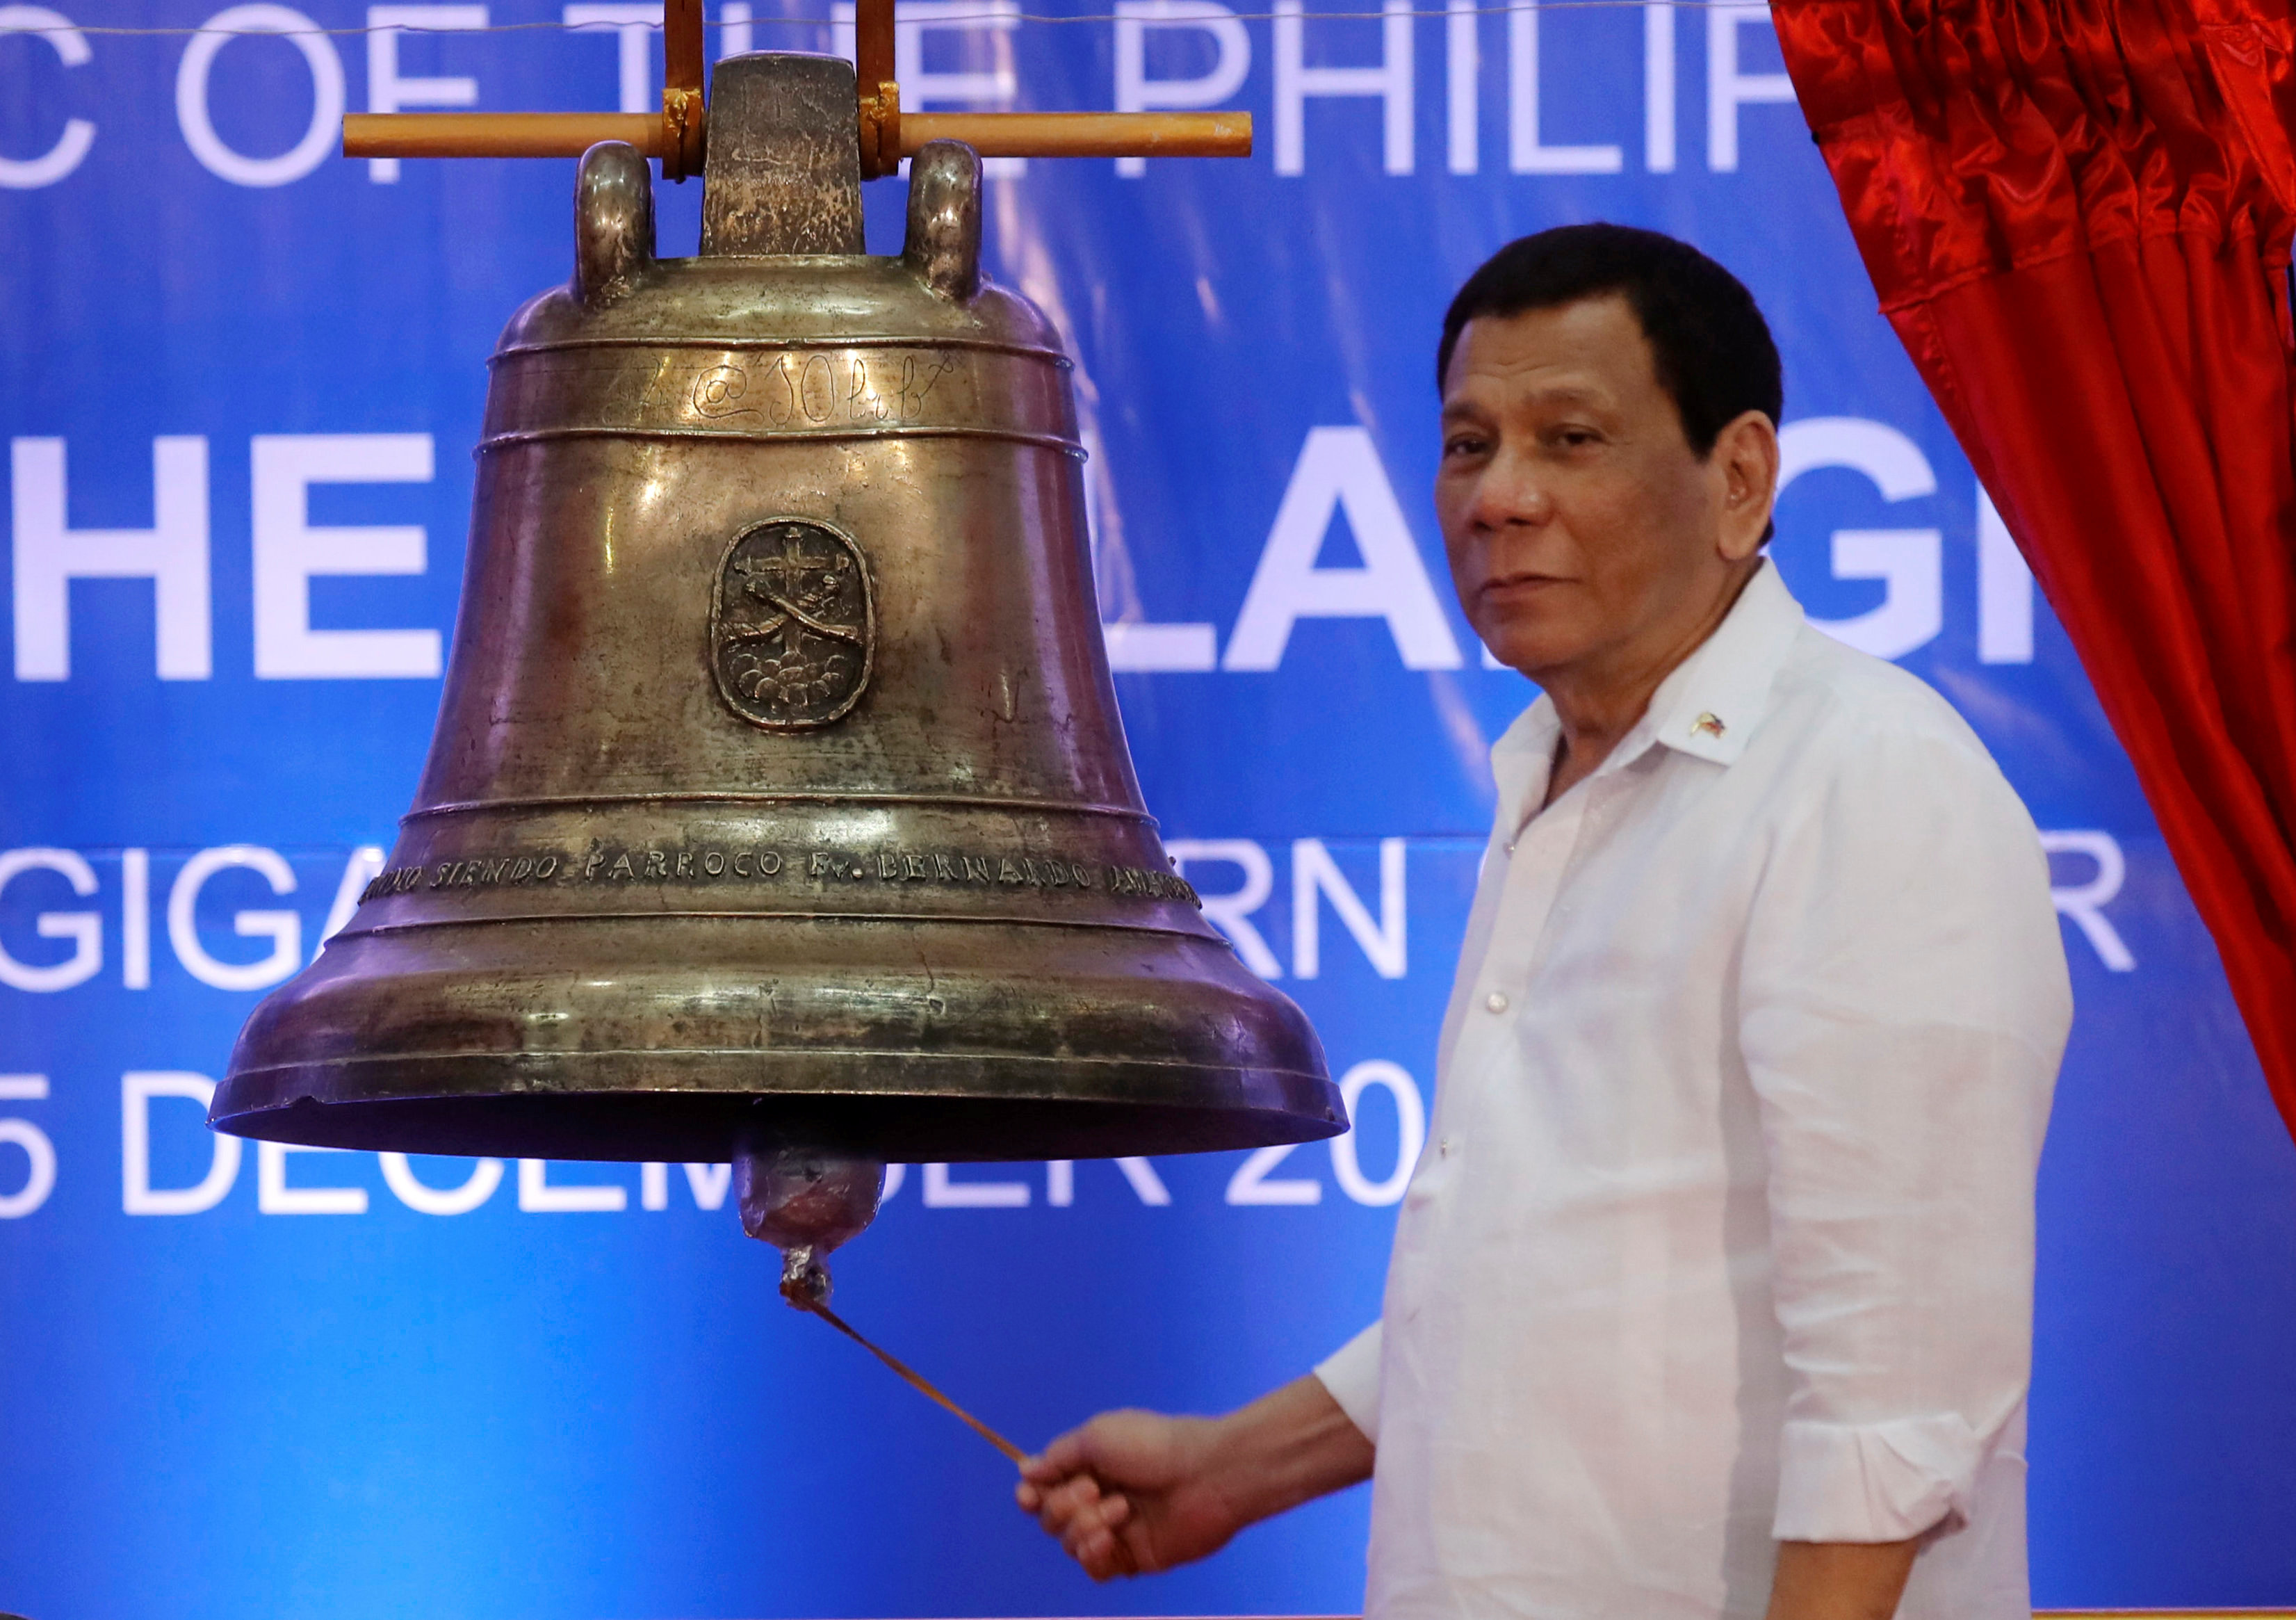 El Presidentede Filipinas, Rodrigo Duterte. - REUTERS